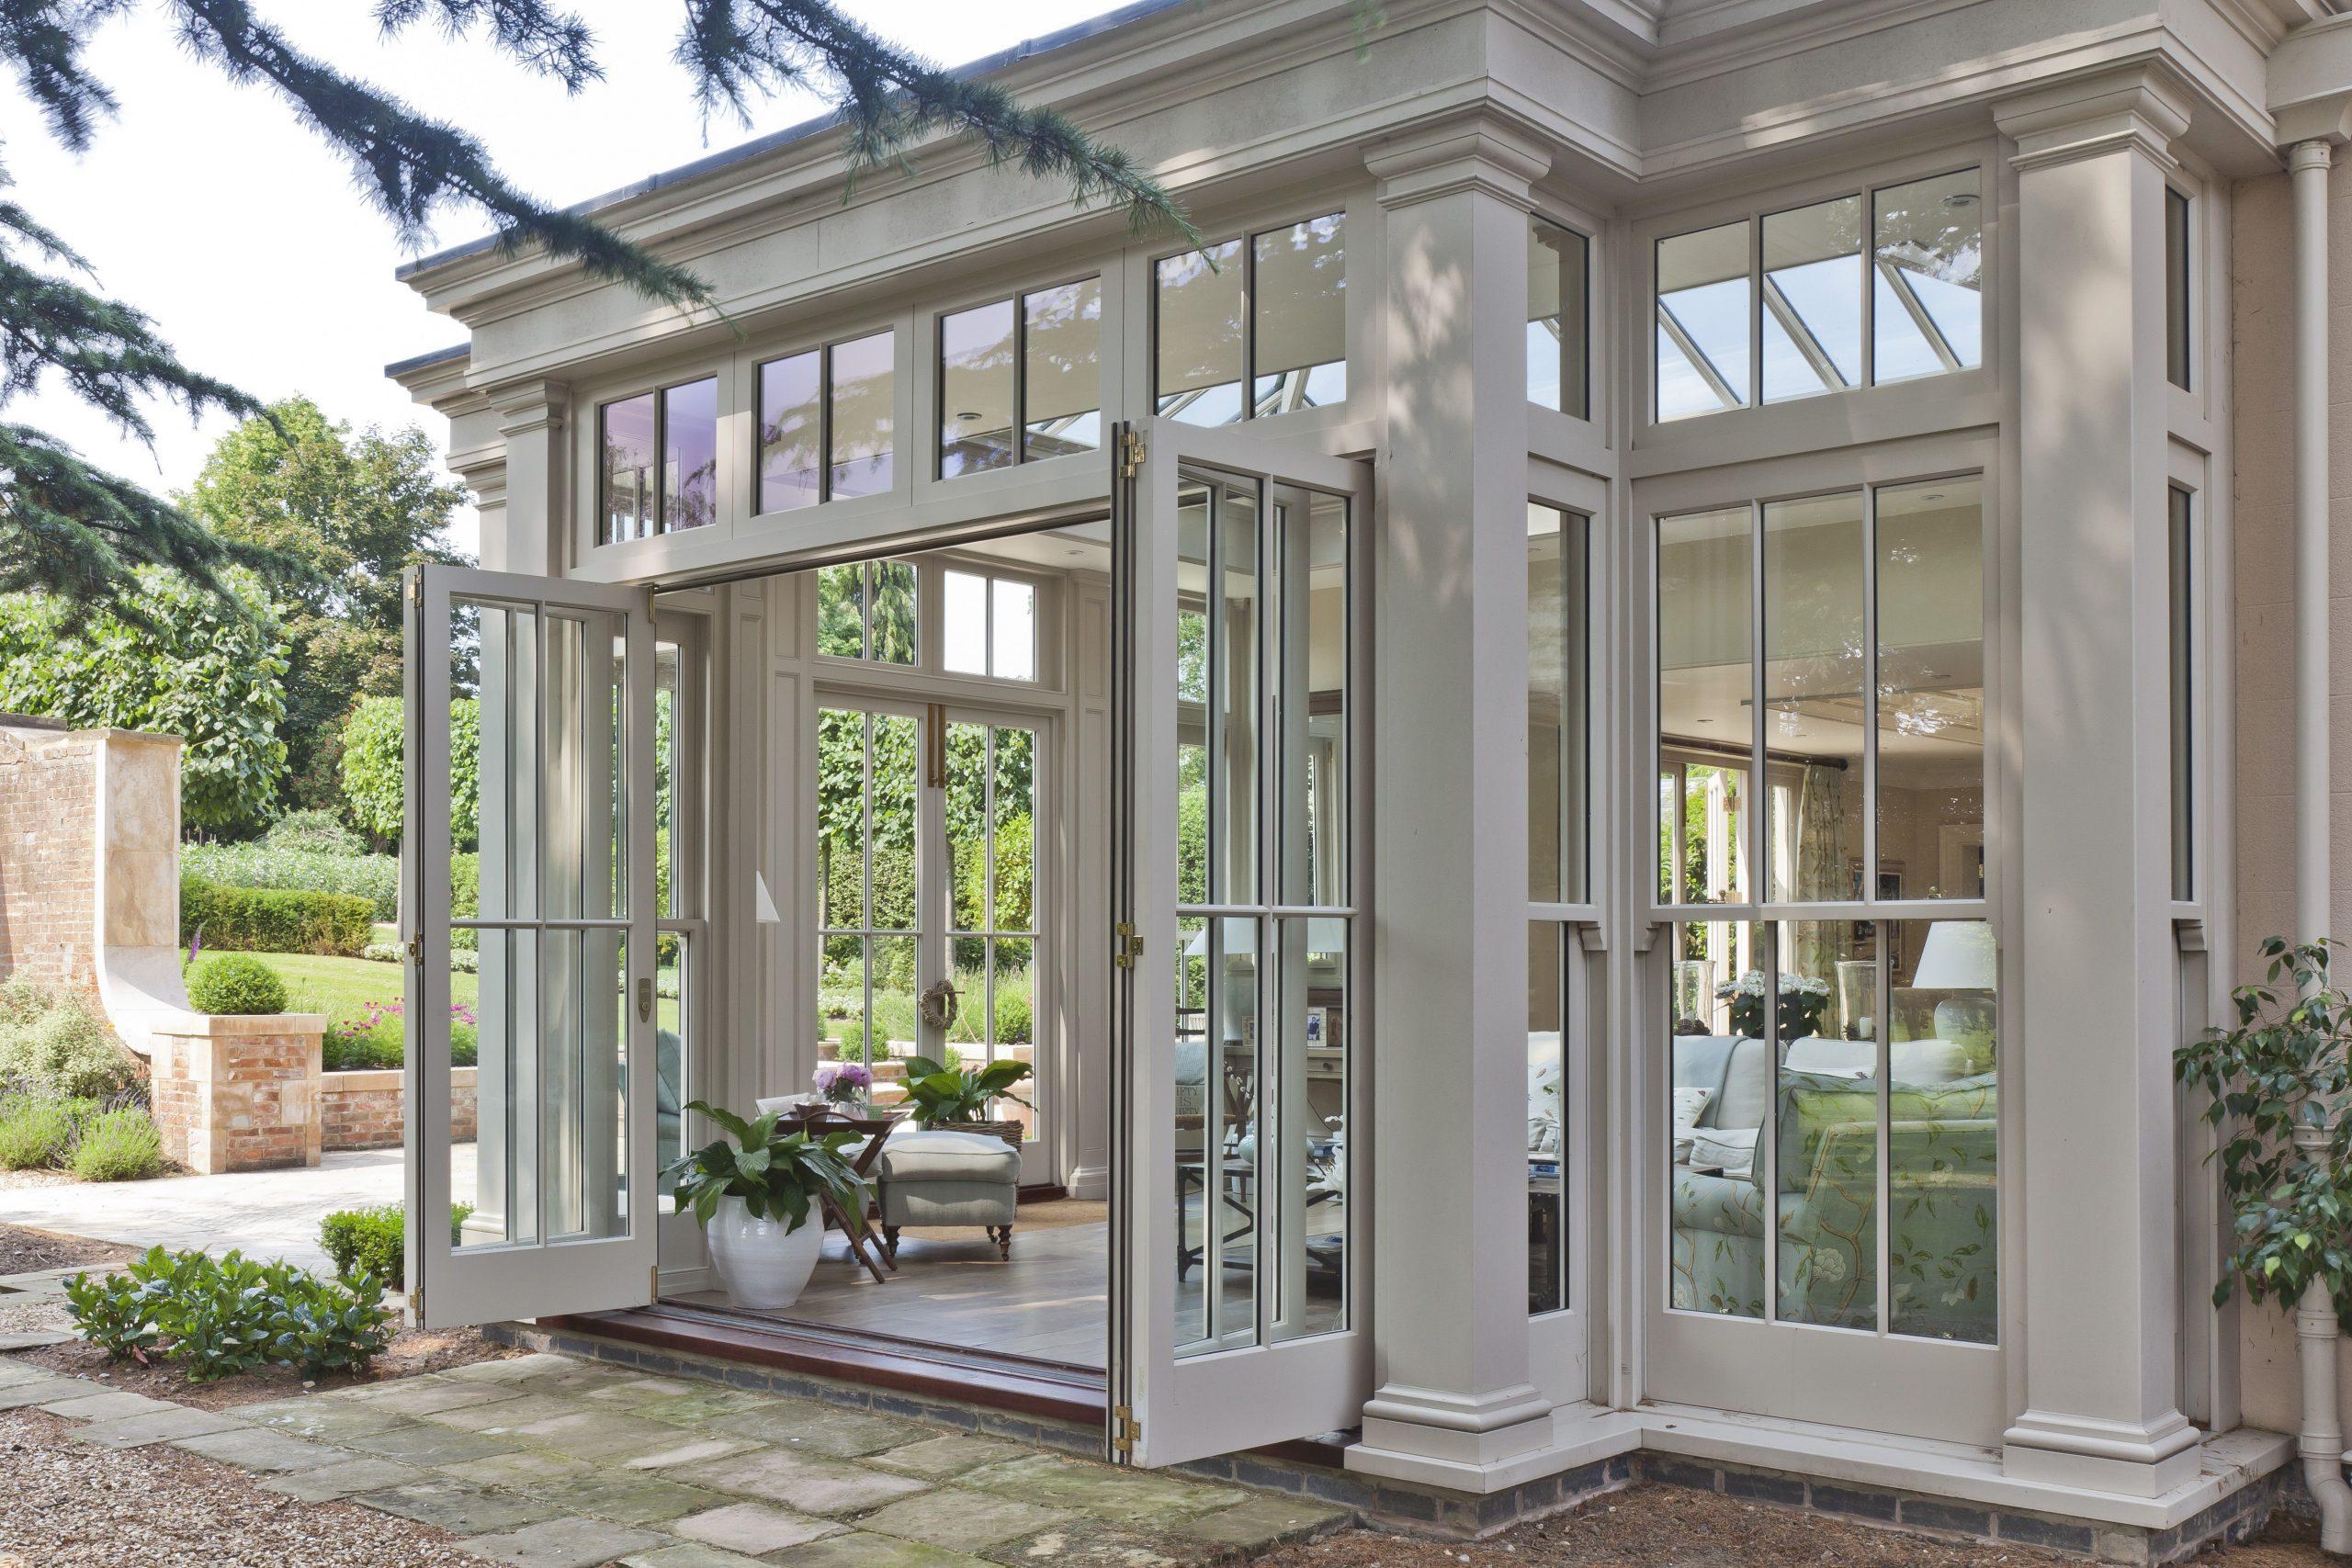 beautiful exterior view sunroom white trim lots of glass all glass walls nj custom sunroom builder